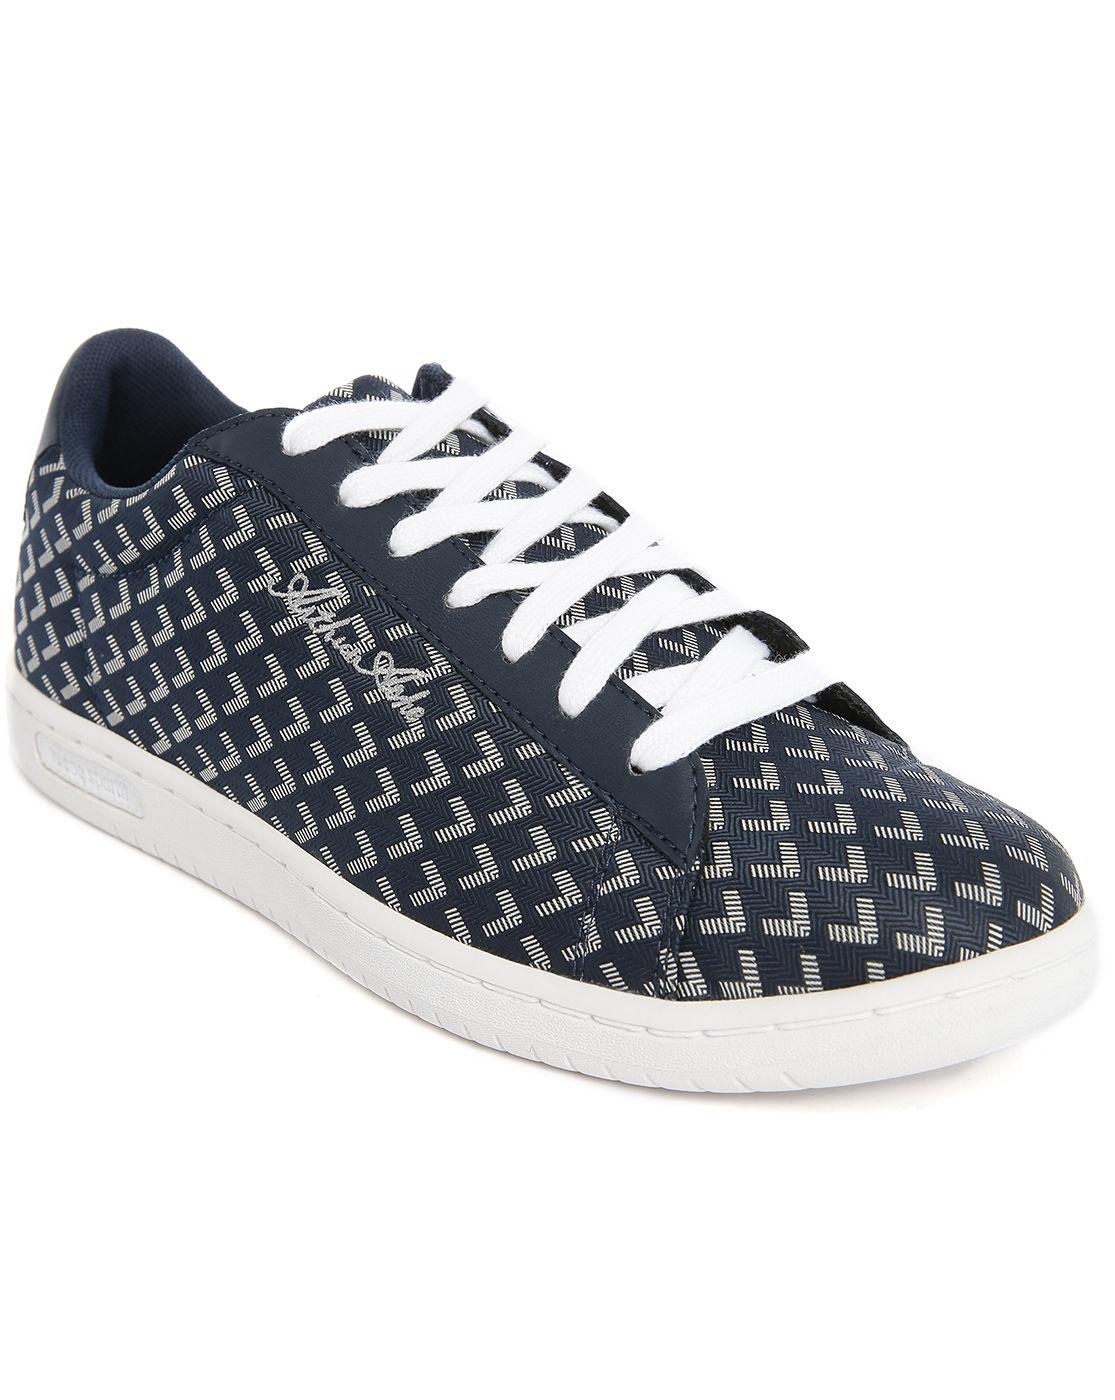 Le Coq Sportif Mens Shoes Usa